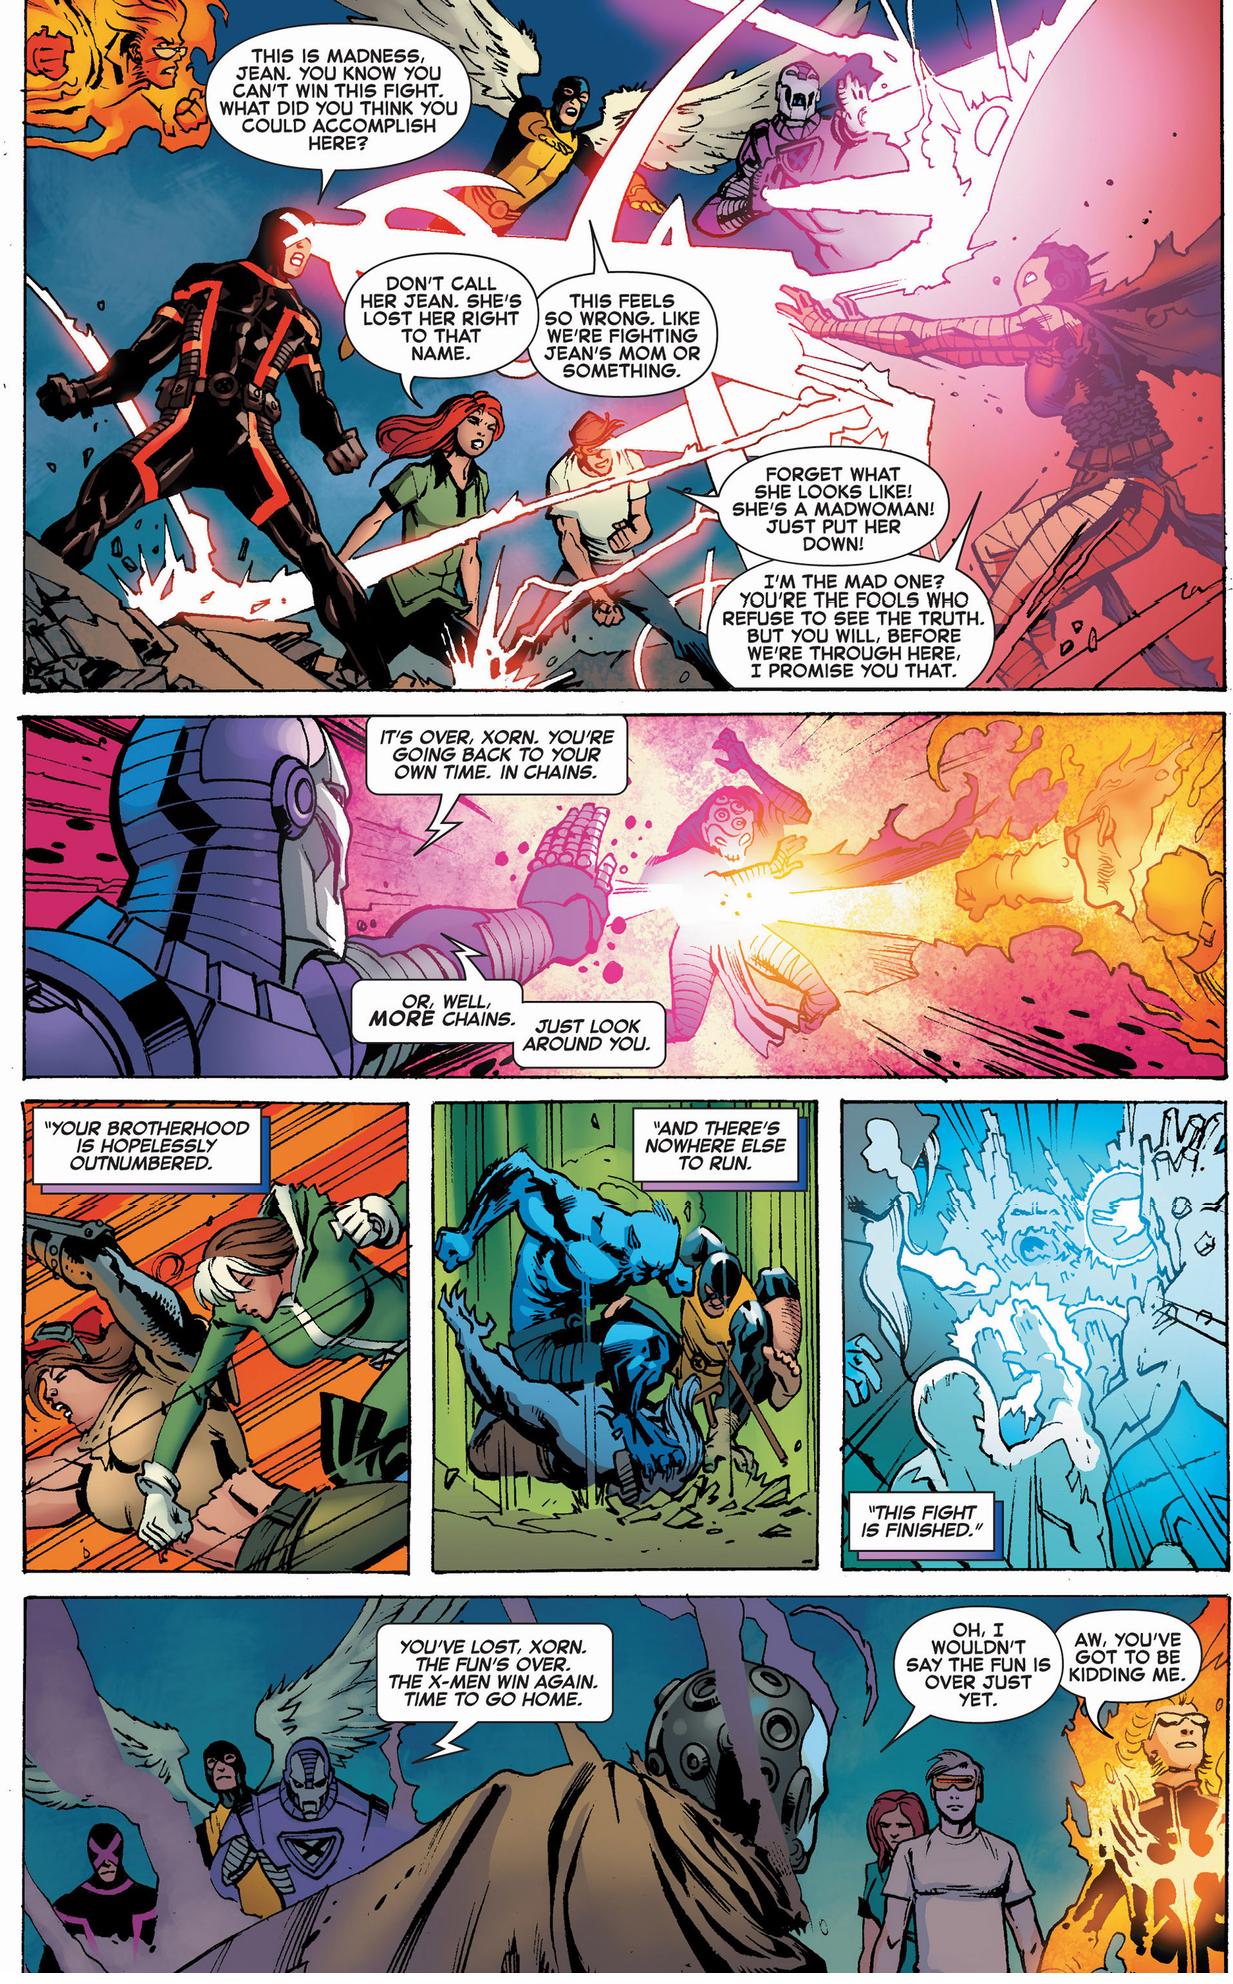 past, present and future x-men vs future brotherhood